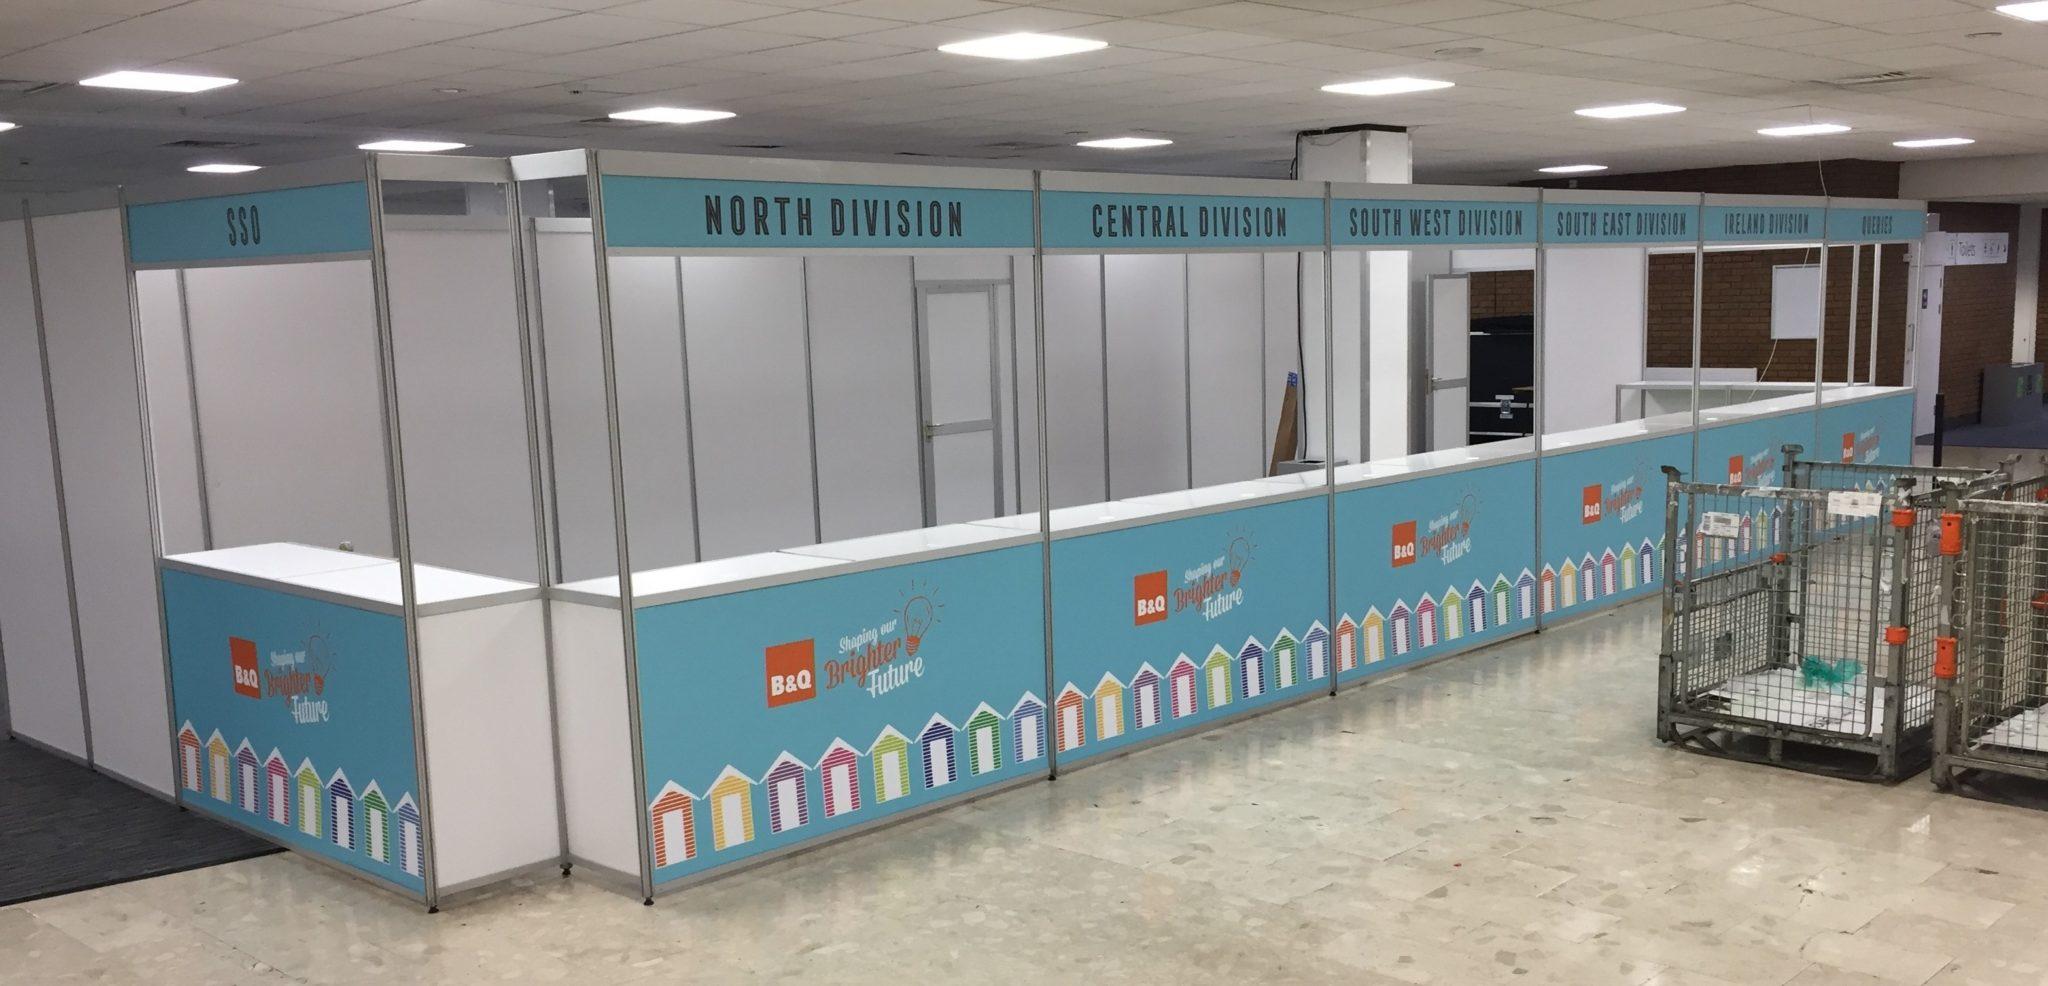 Exhibition Shell Scheme Hire : Shell scheme exhibition stands are exhibitions